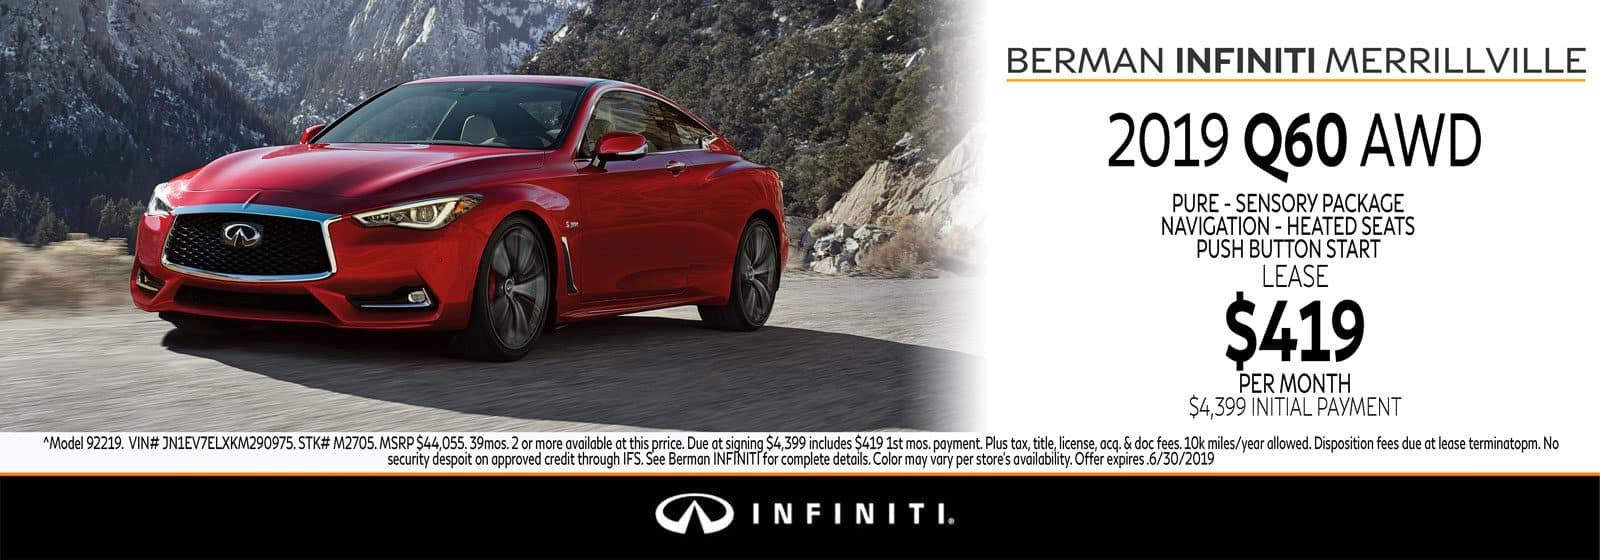 New 2019 INFINITI Q60 June Offer at Berman INFINITI of Merrillville!